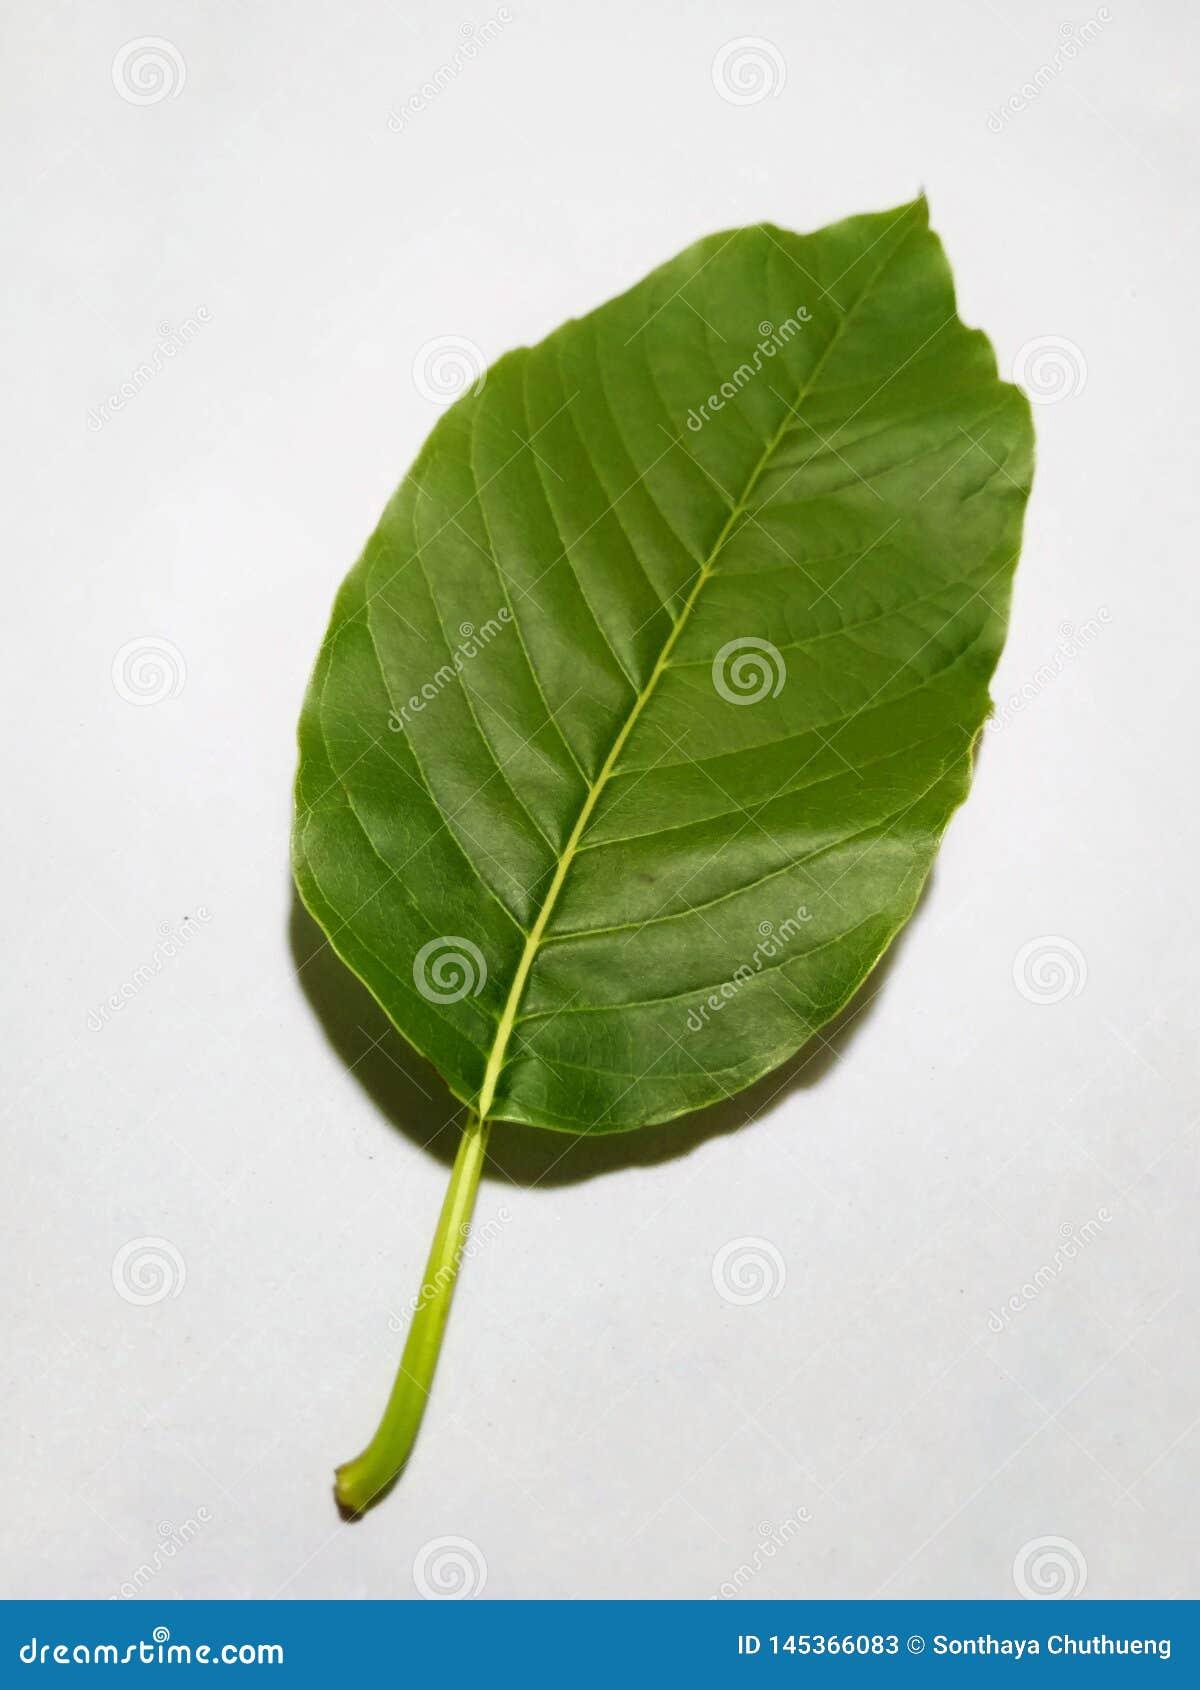 Kratom leaves on a white background